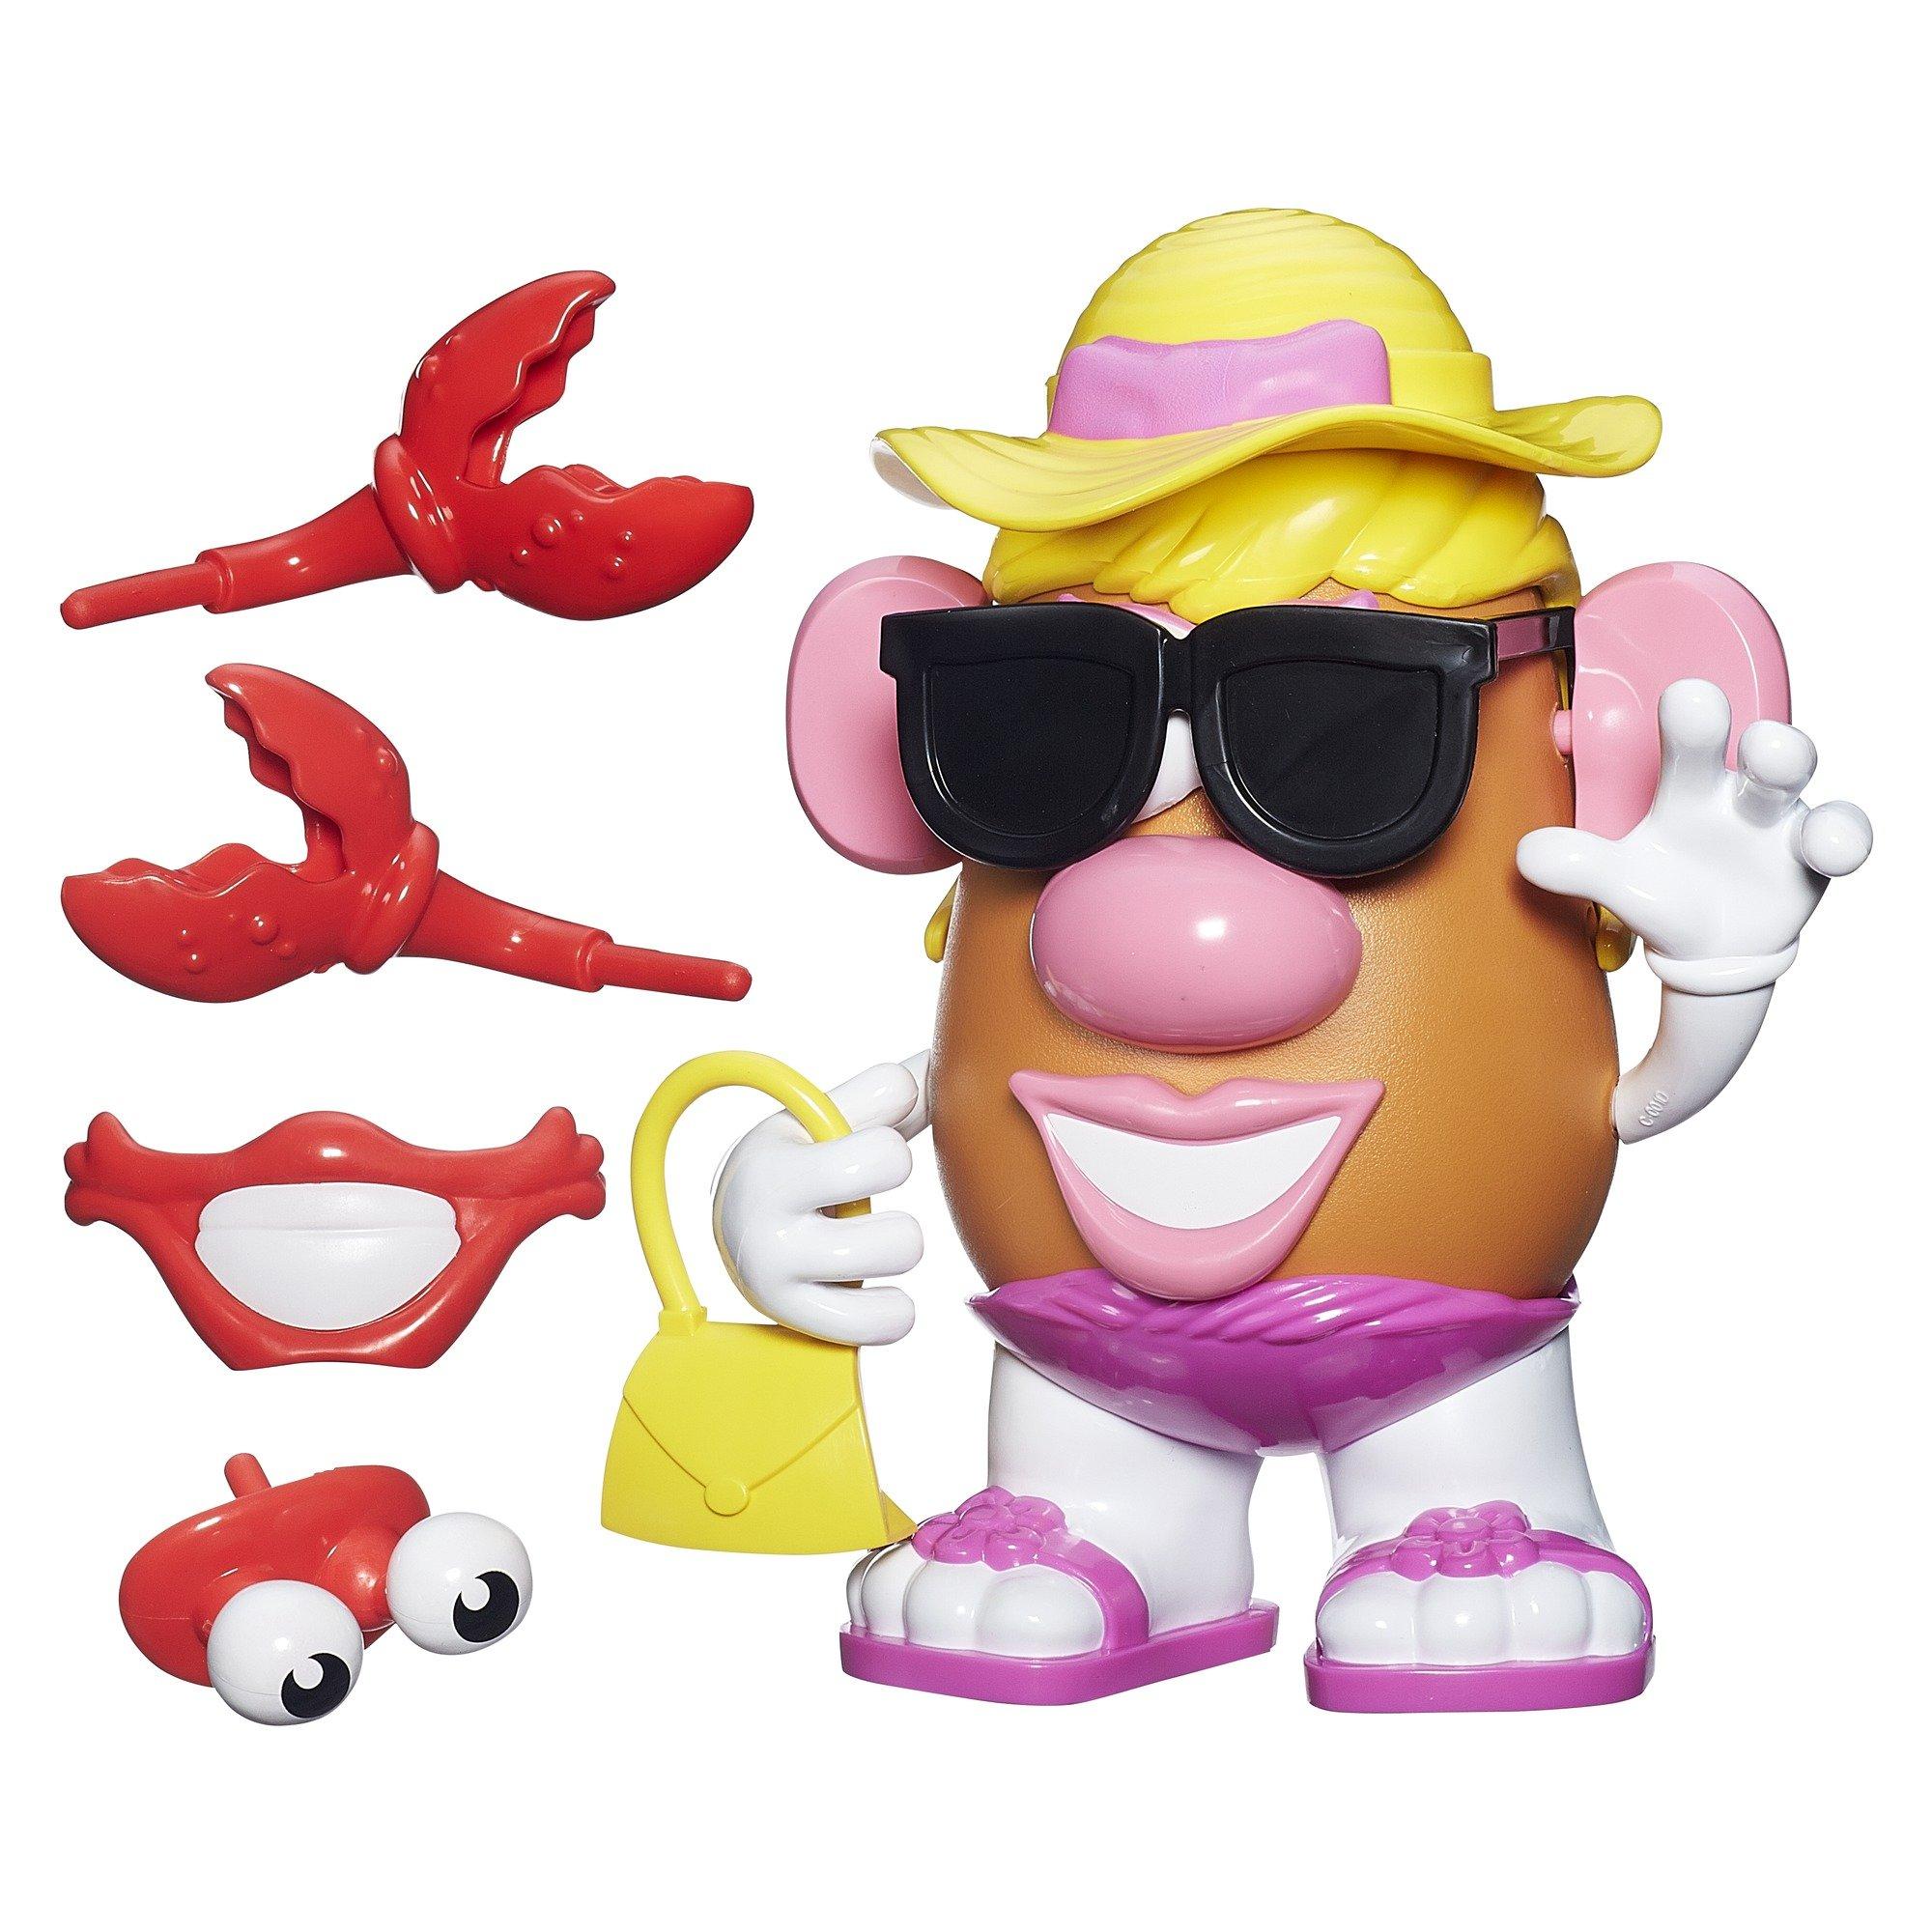 Mr Potato Head Playskool Beach Spudette